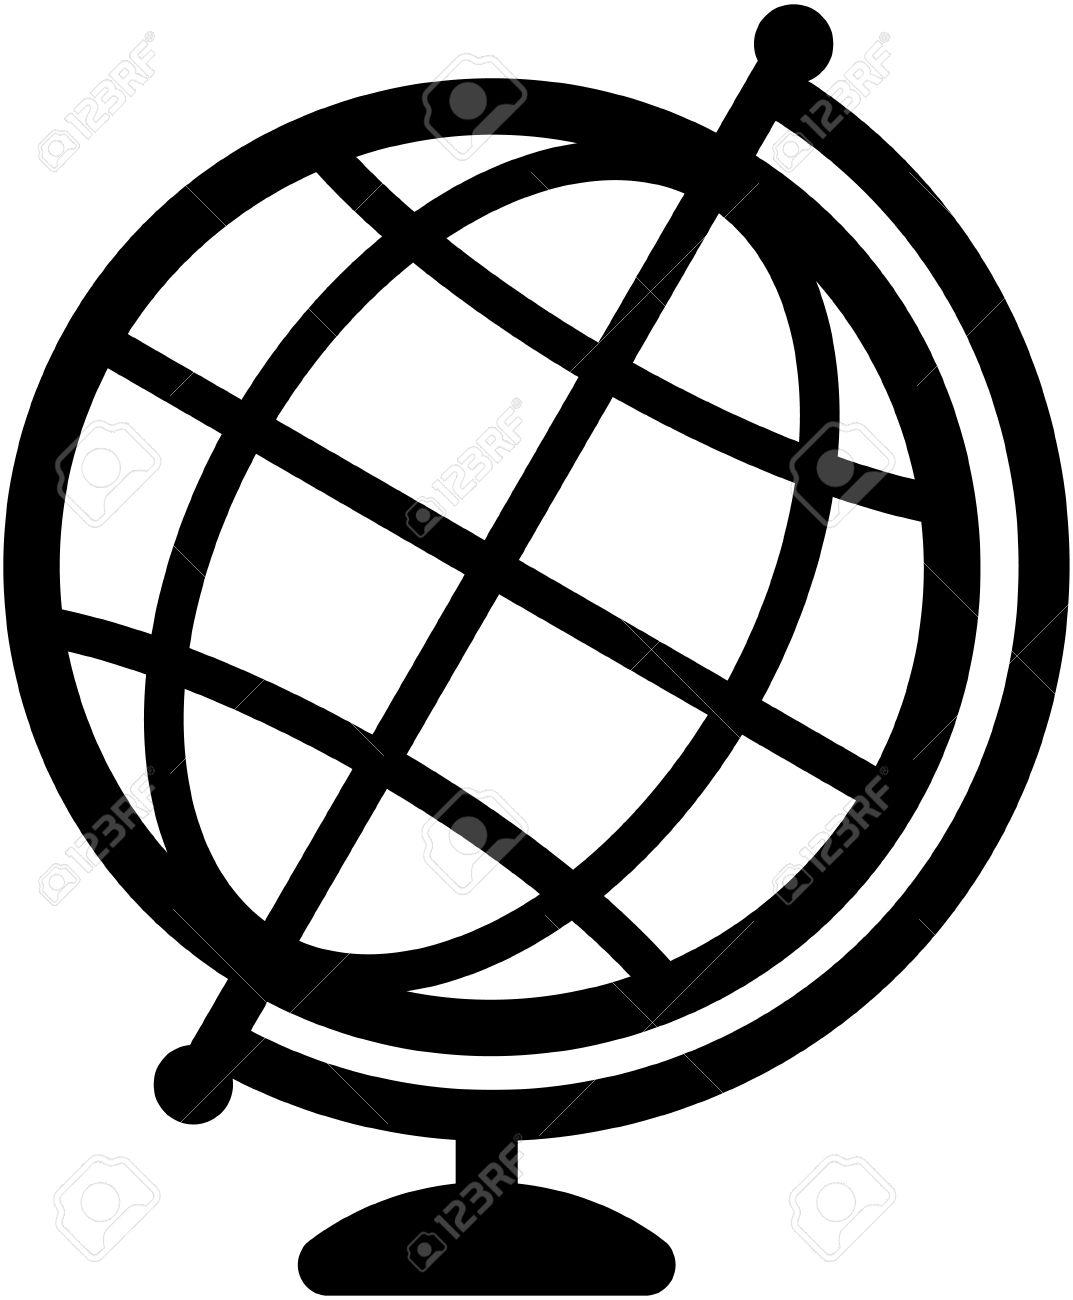 Geografie clipart picture transparent download Geografie clipart 6 » Clipart Station picture transparent download